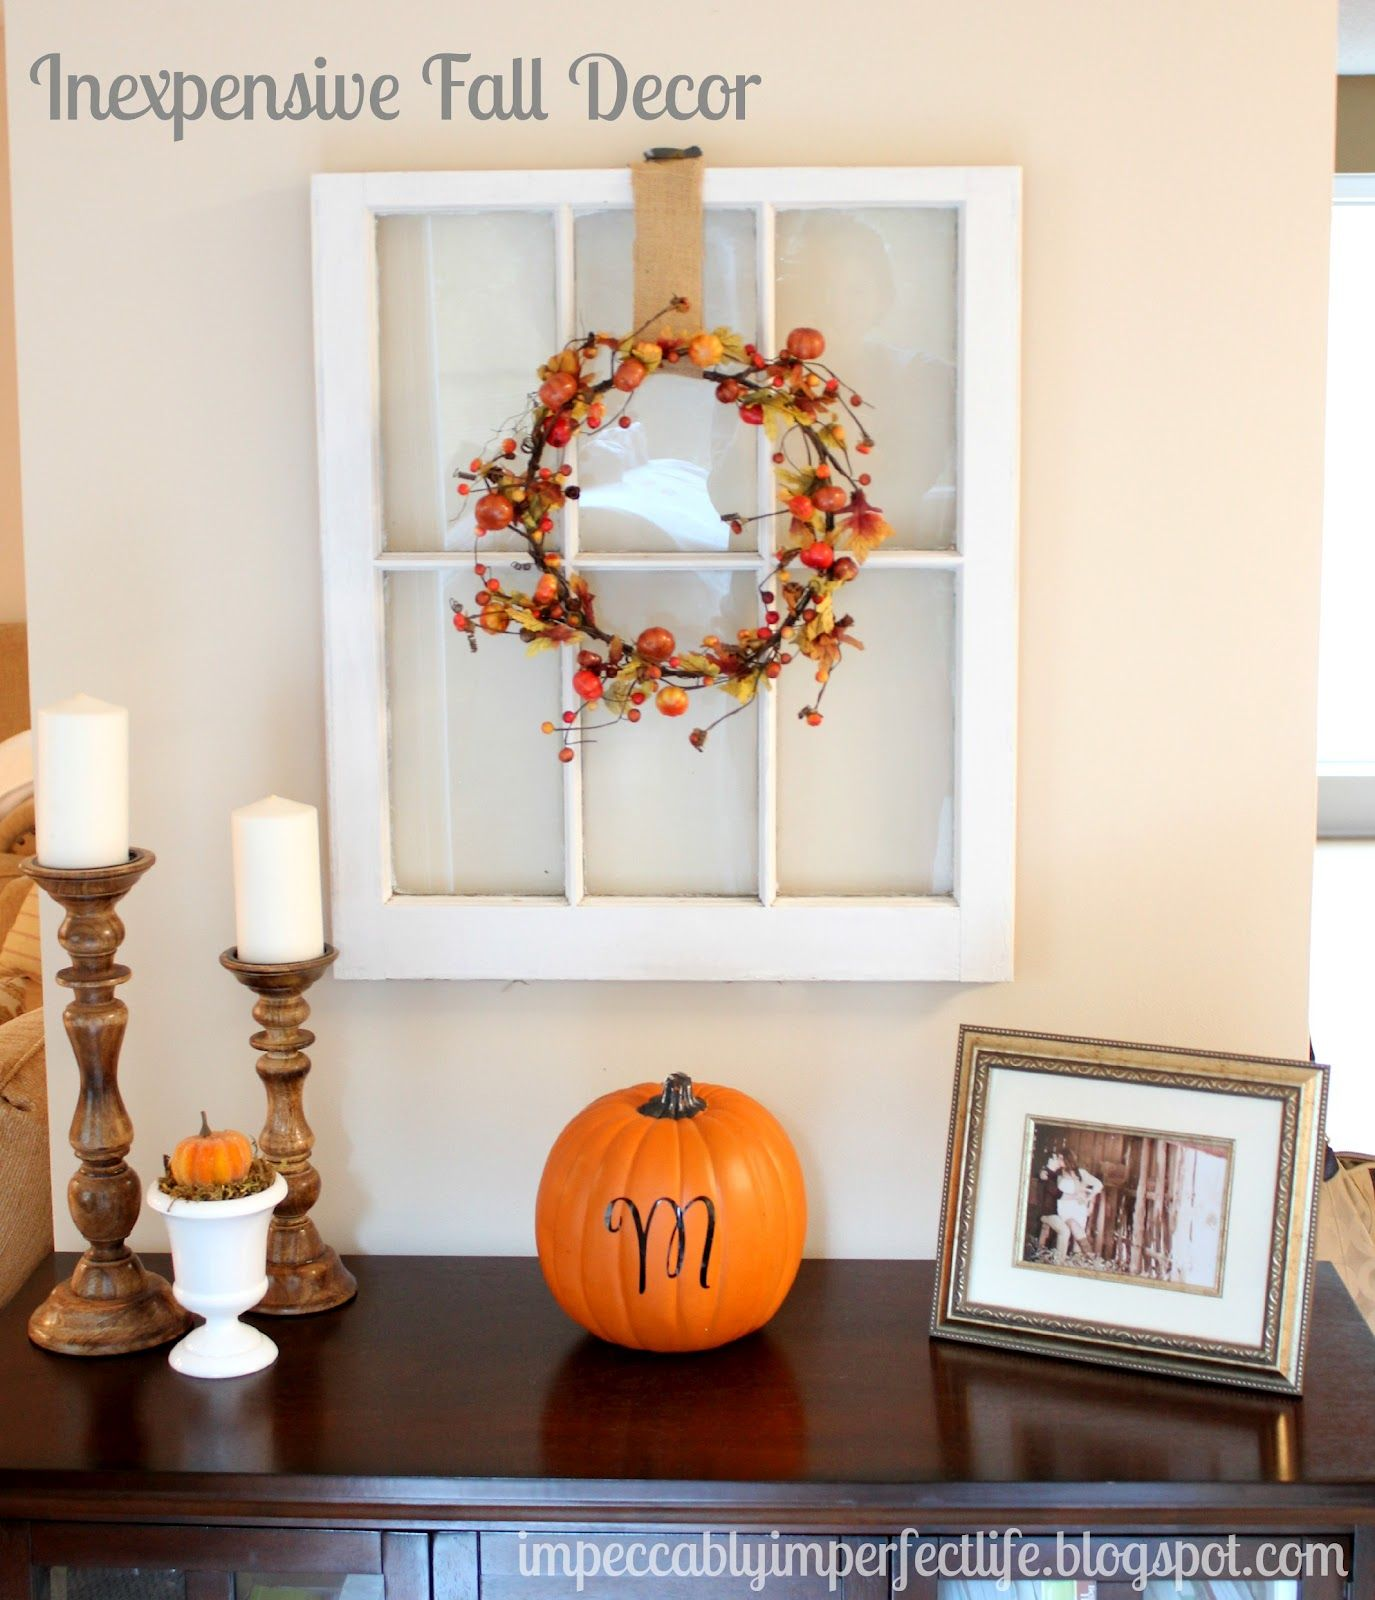 Window Pane Fall Decor For The Home Fall Fall Decor